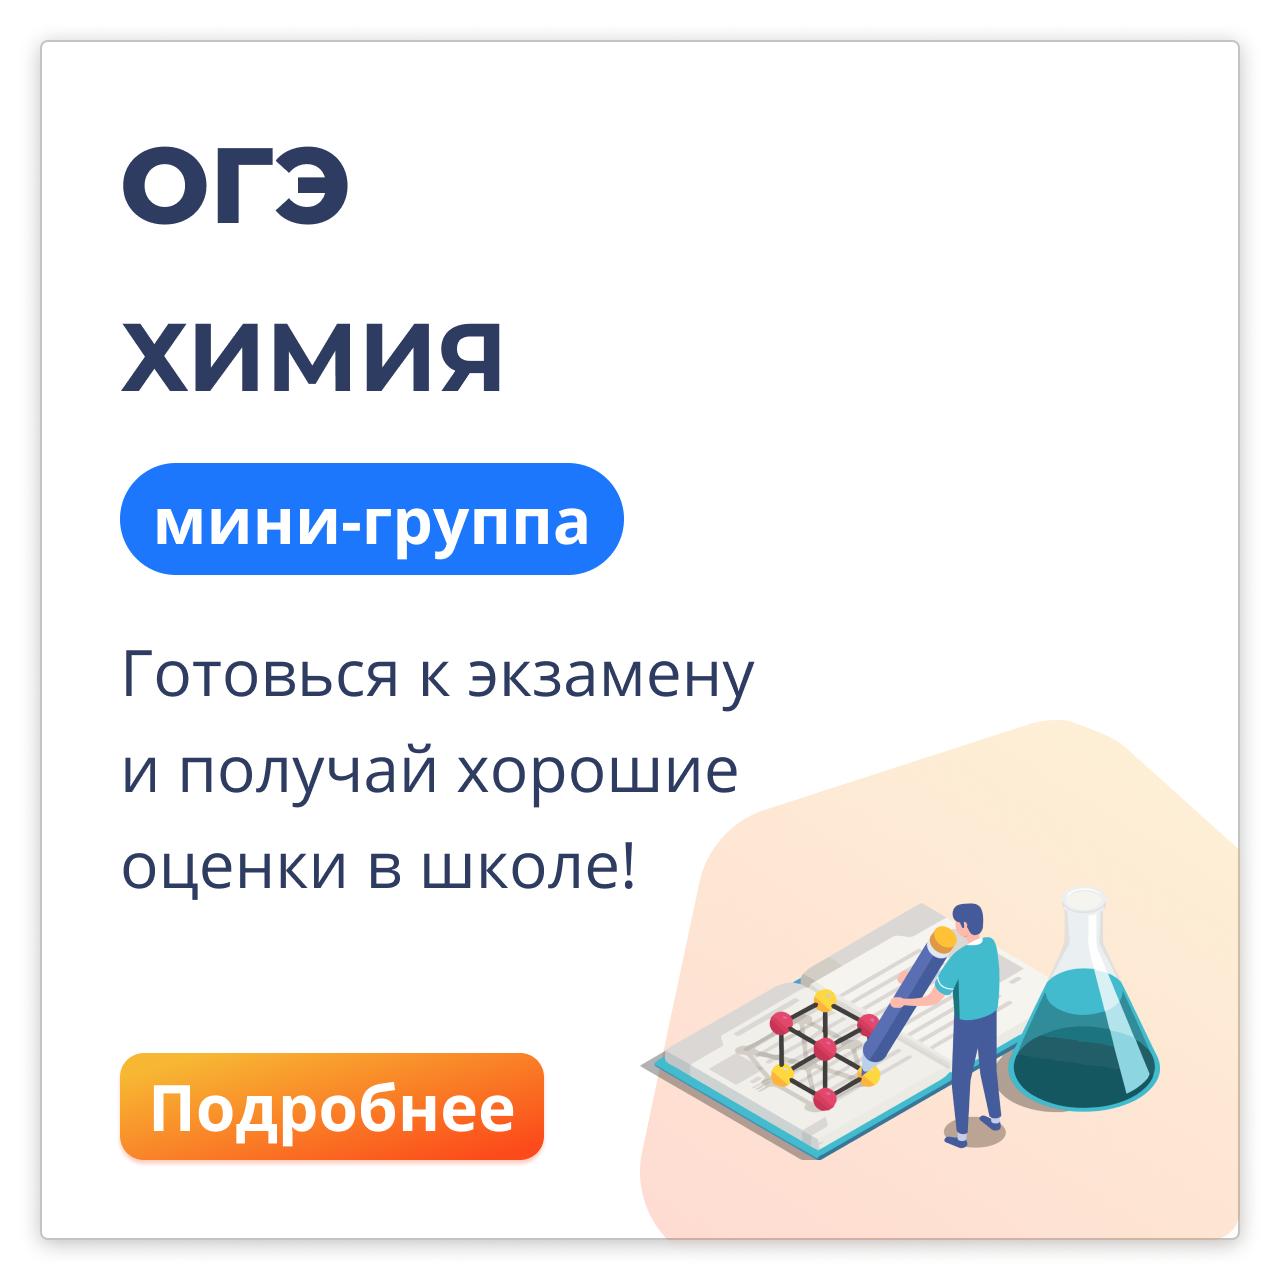 Химия ОГЭ Онлайн мини-группа